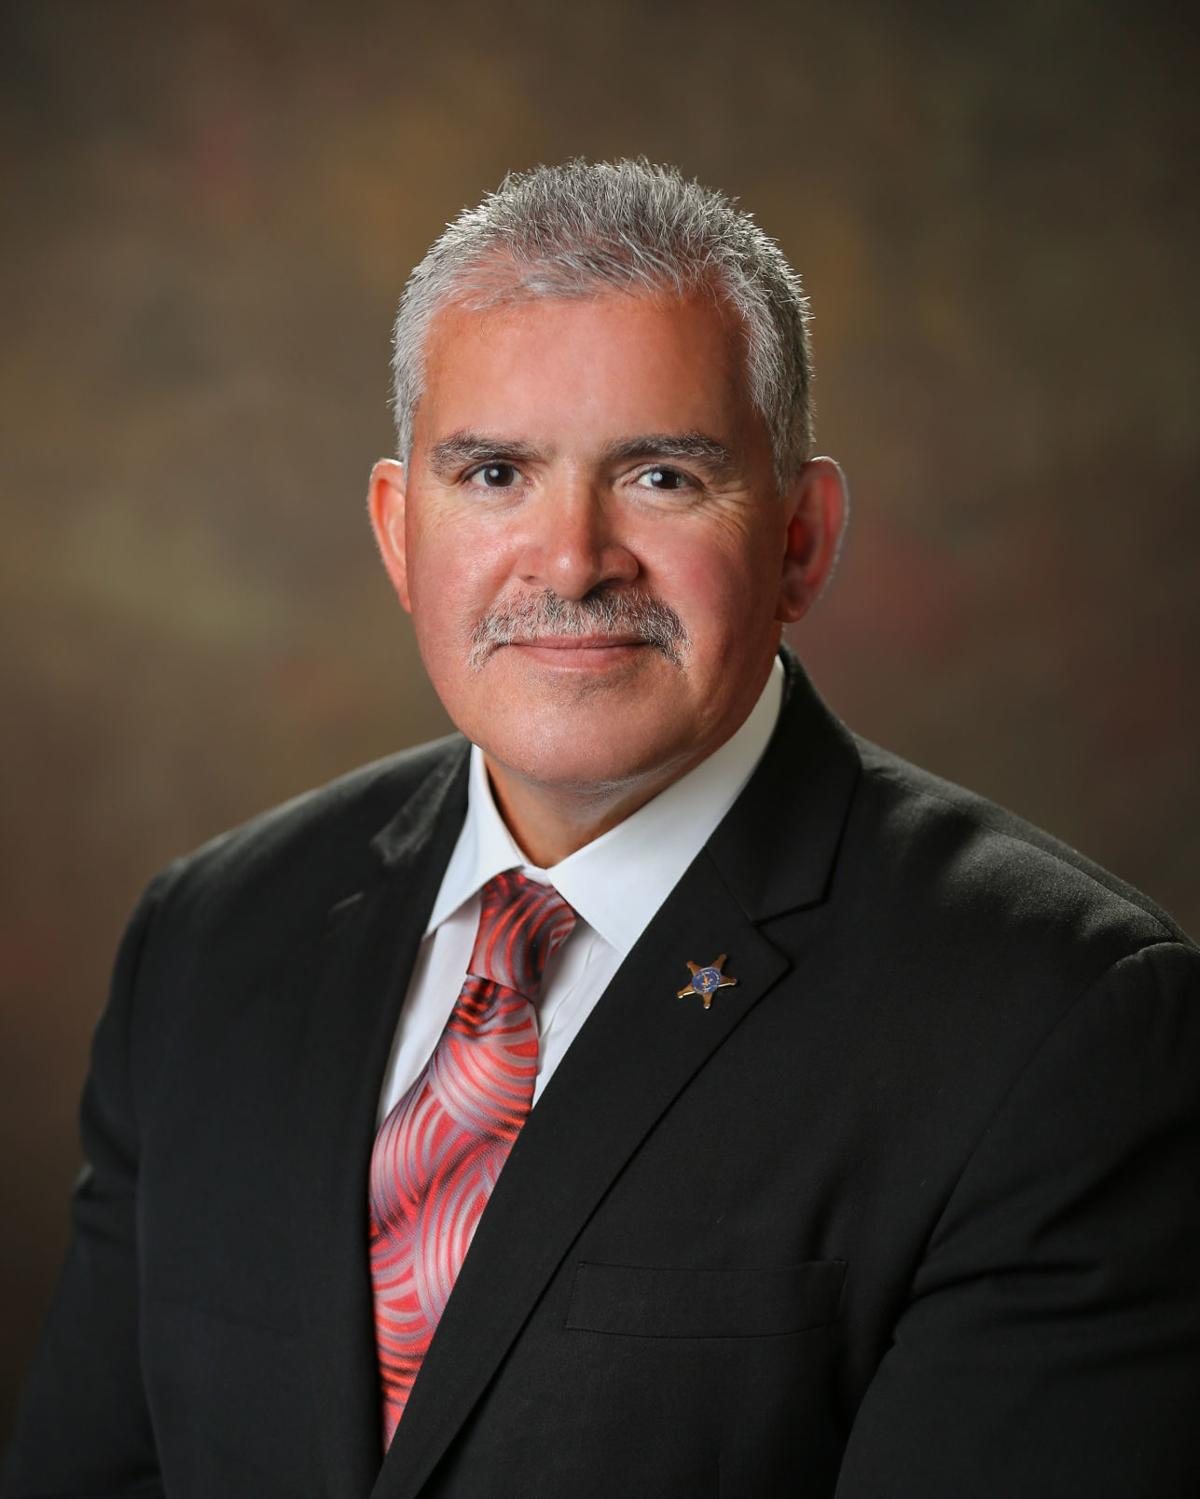 Gerry Bustos